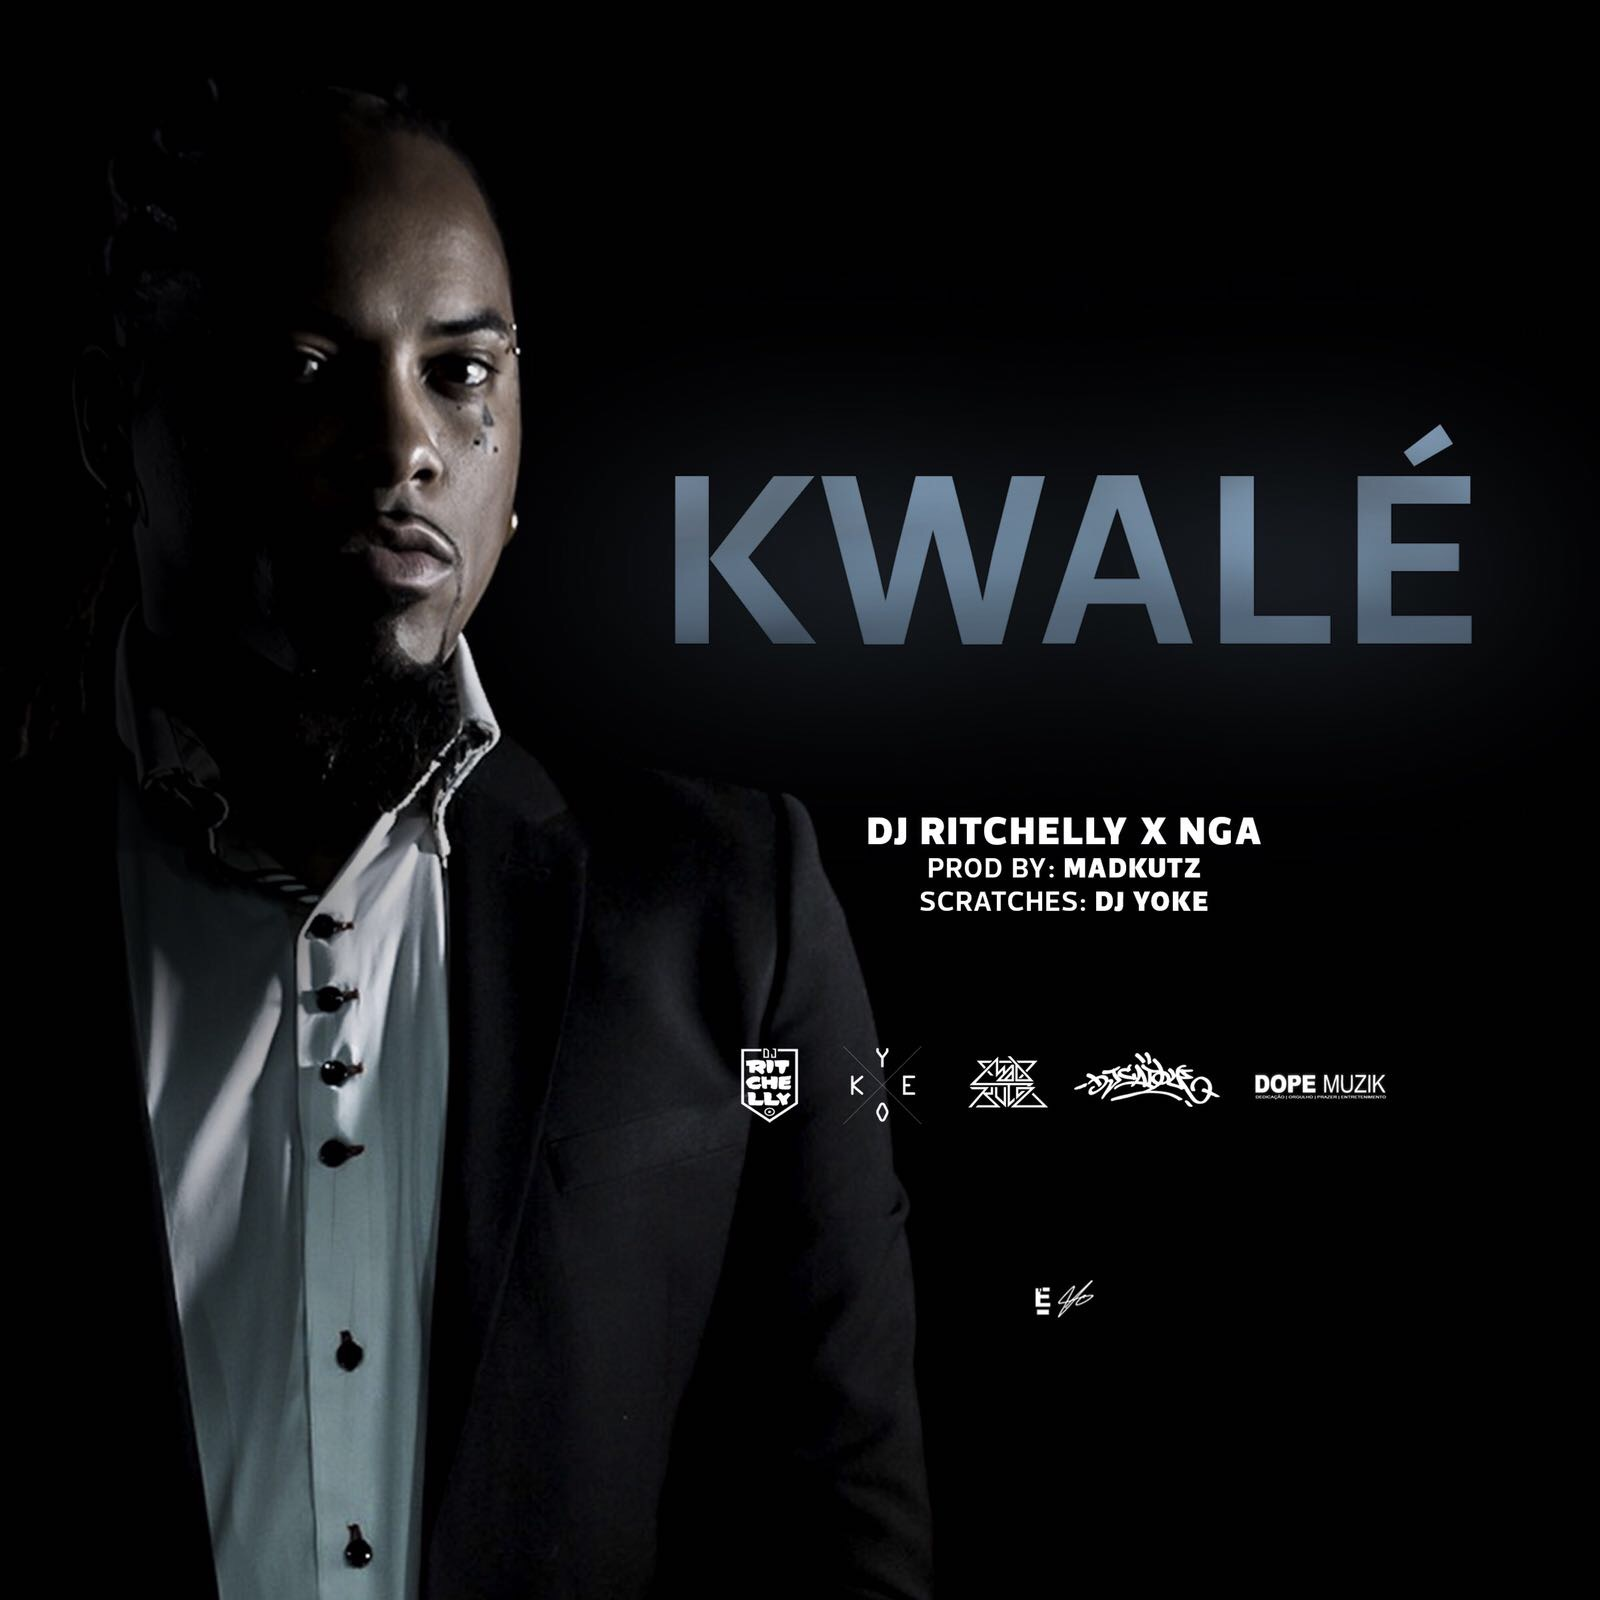 Kwalé